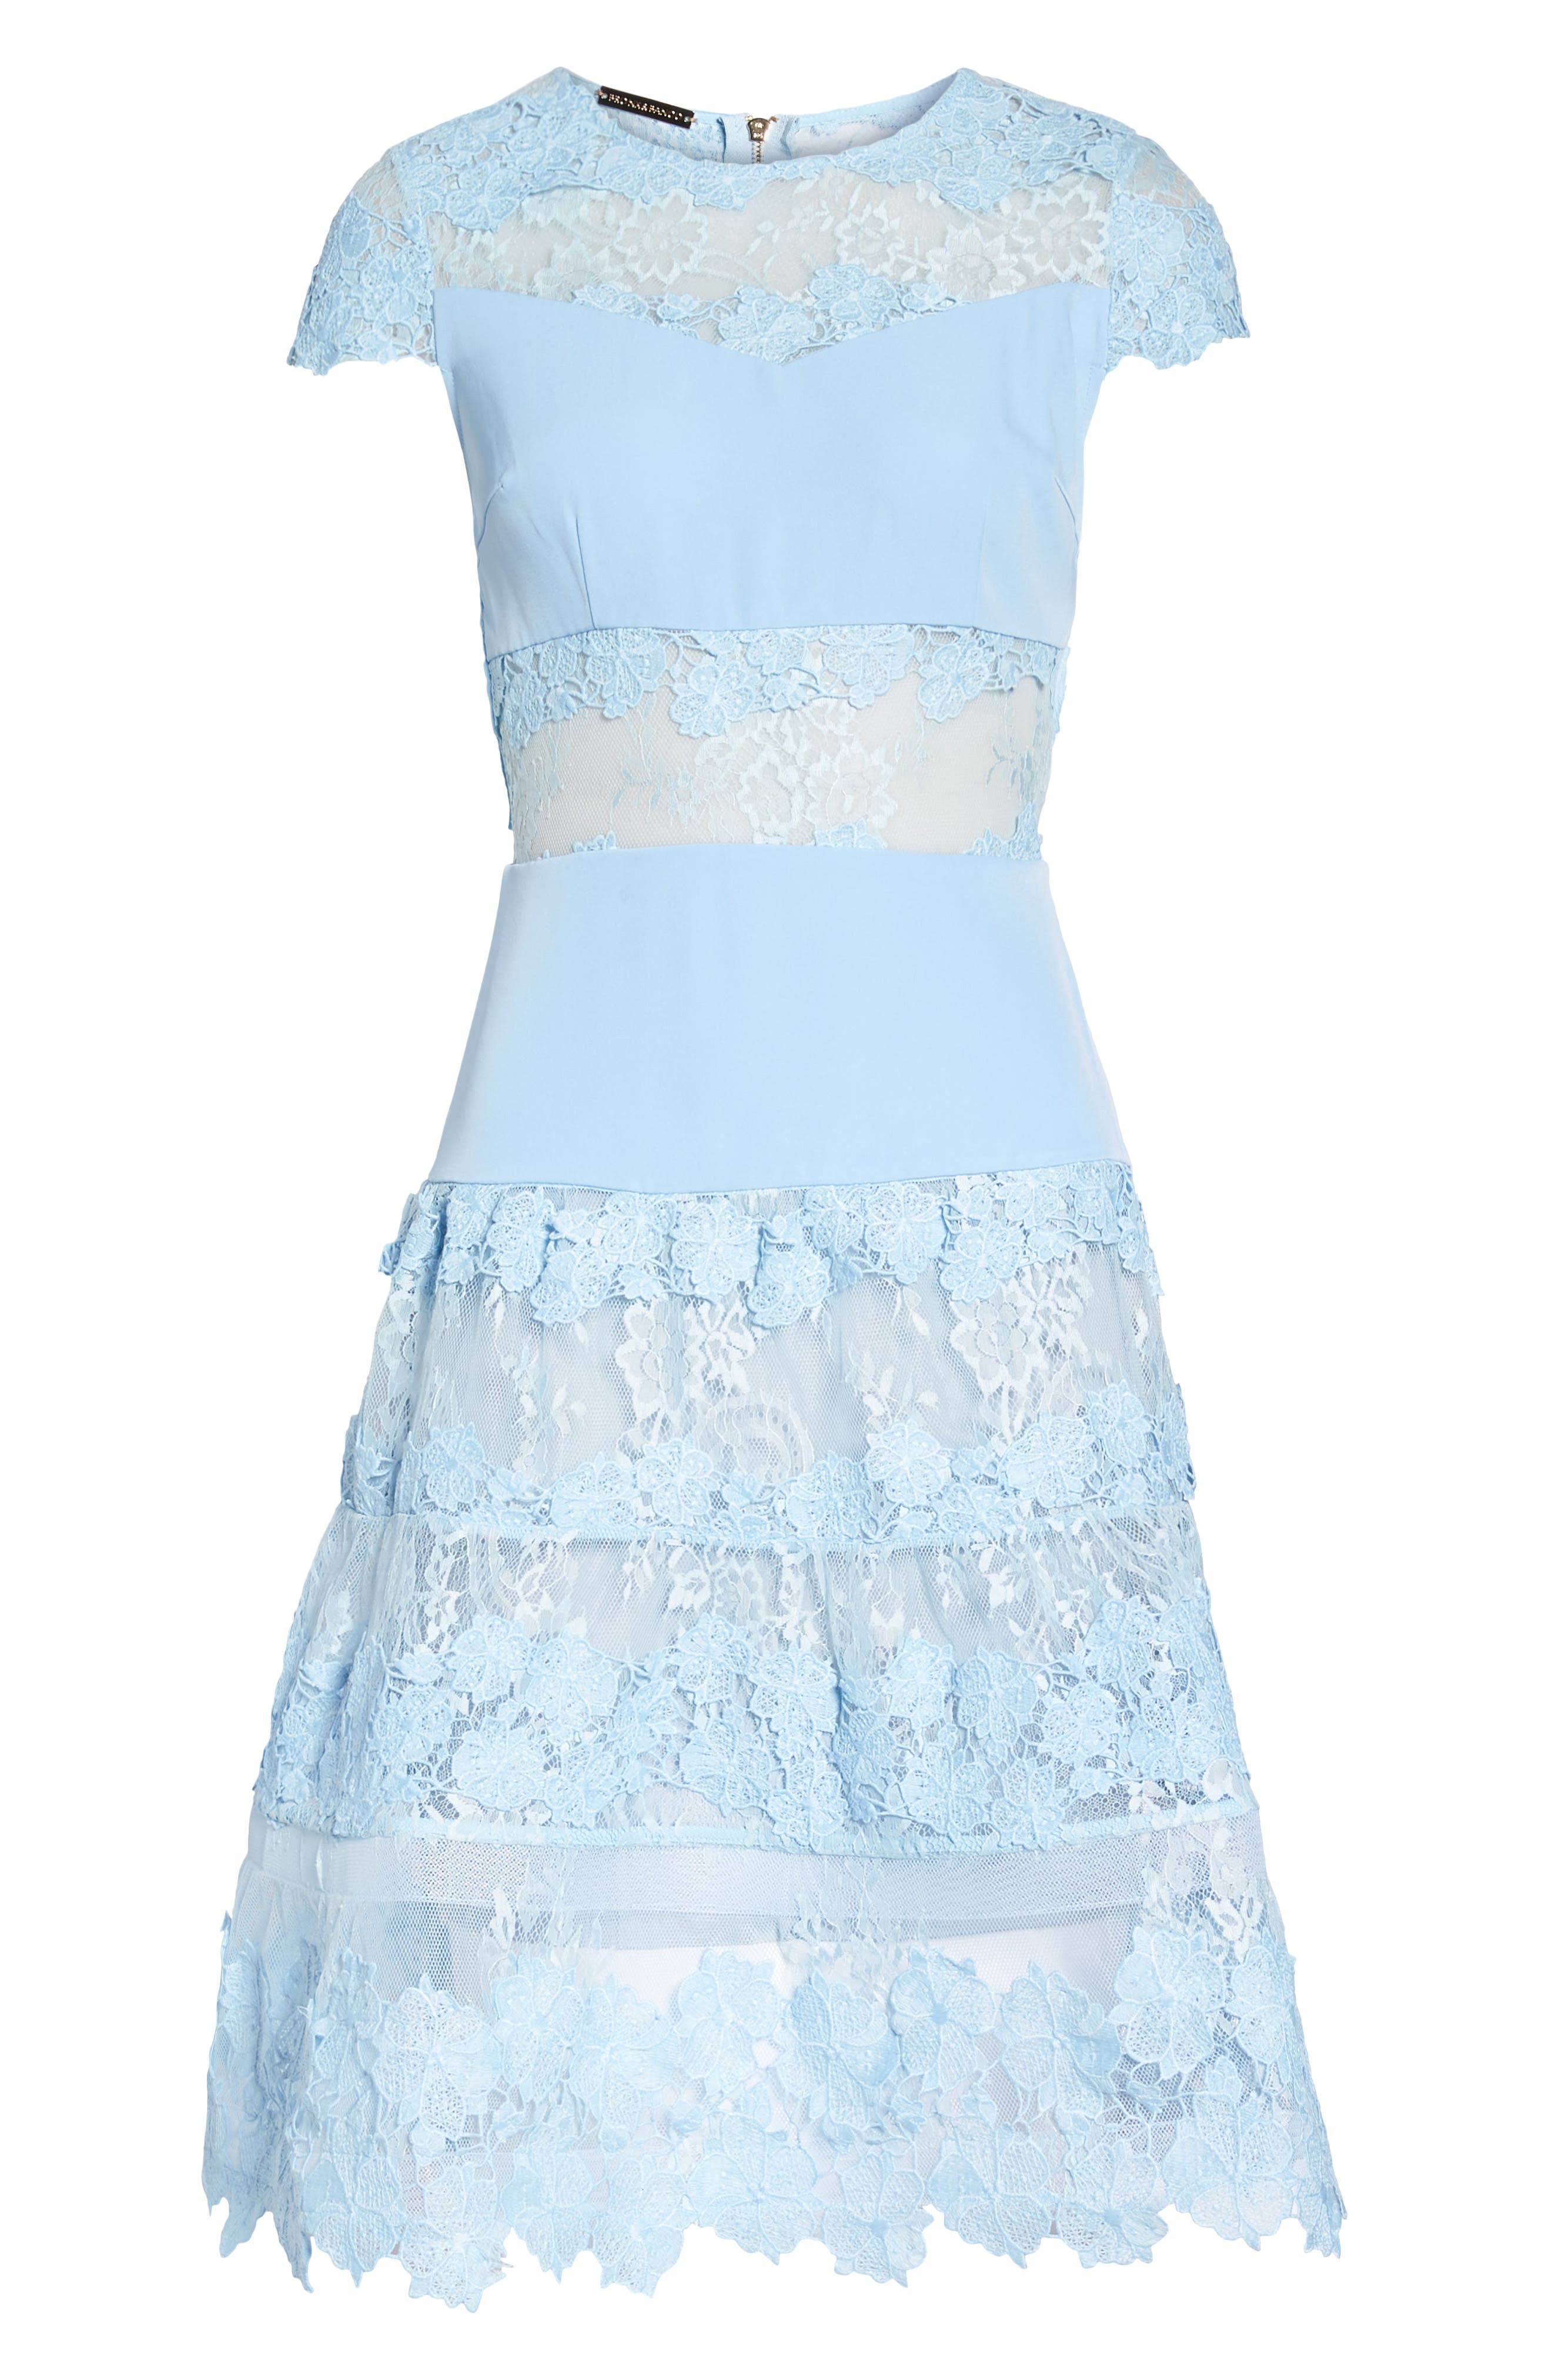 Flamenco Lace Fit & Flare Dress,                             Alternate thumbnail 6, color,                             Blue